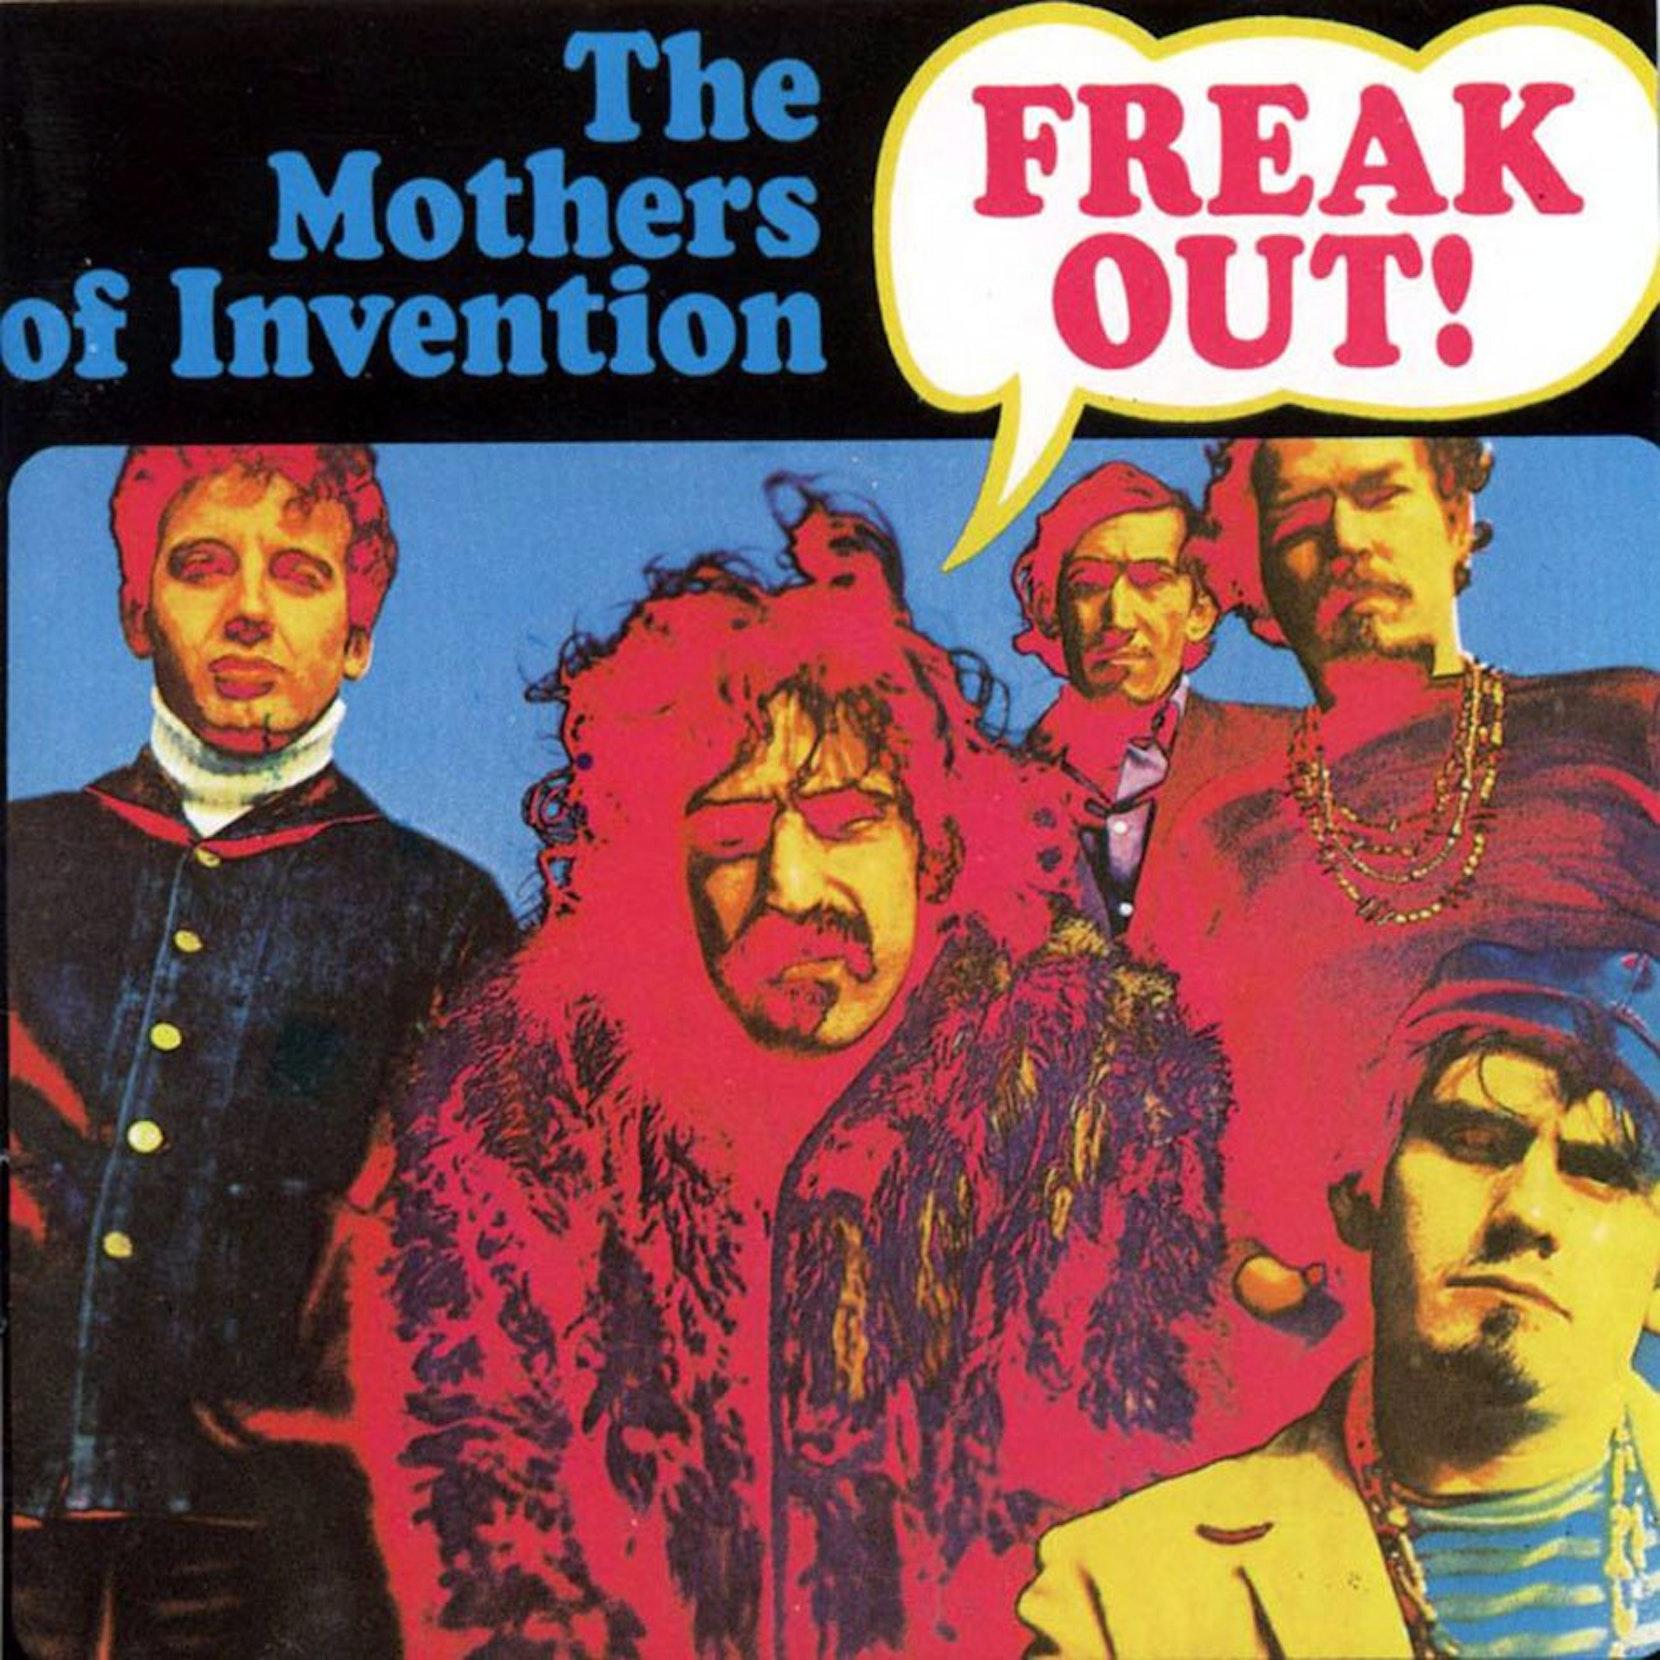 The 10 Best Frank Zappa Albums To Own On Vinyl Vinyl Me